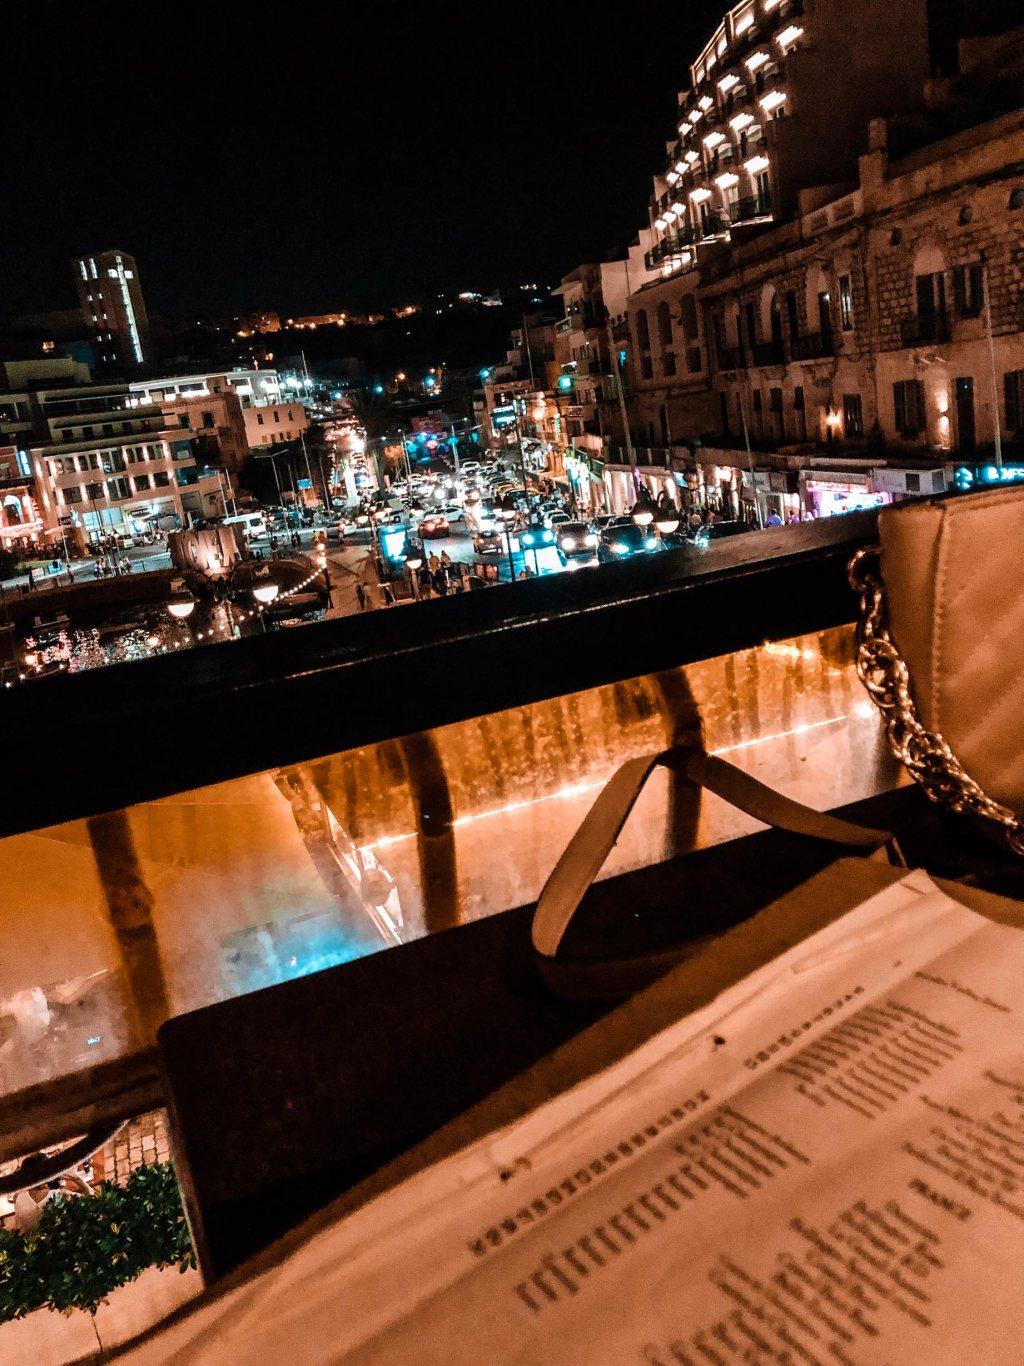 lore-fitch-restaurant-malta-ravintola-malta-pihviravintola